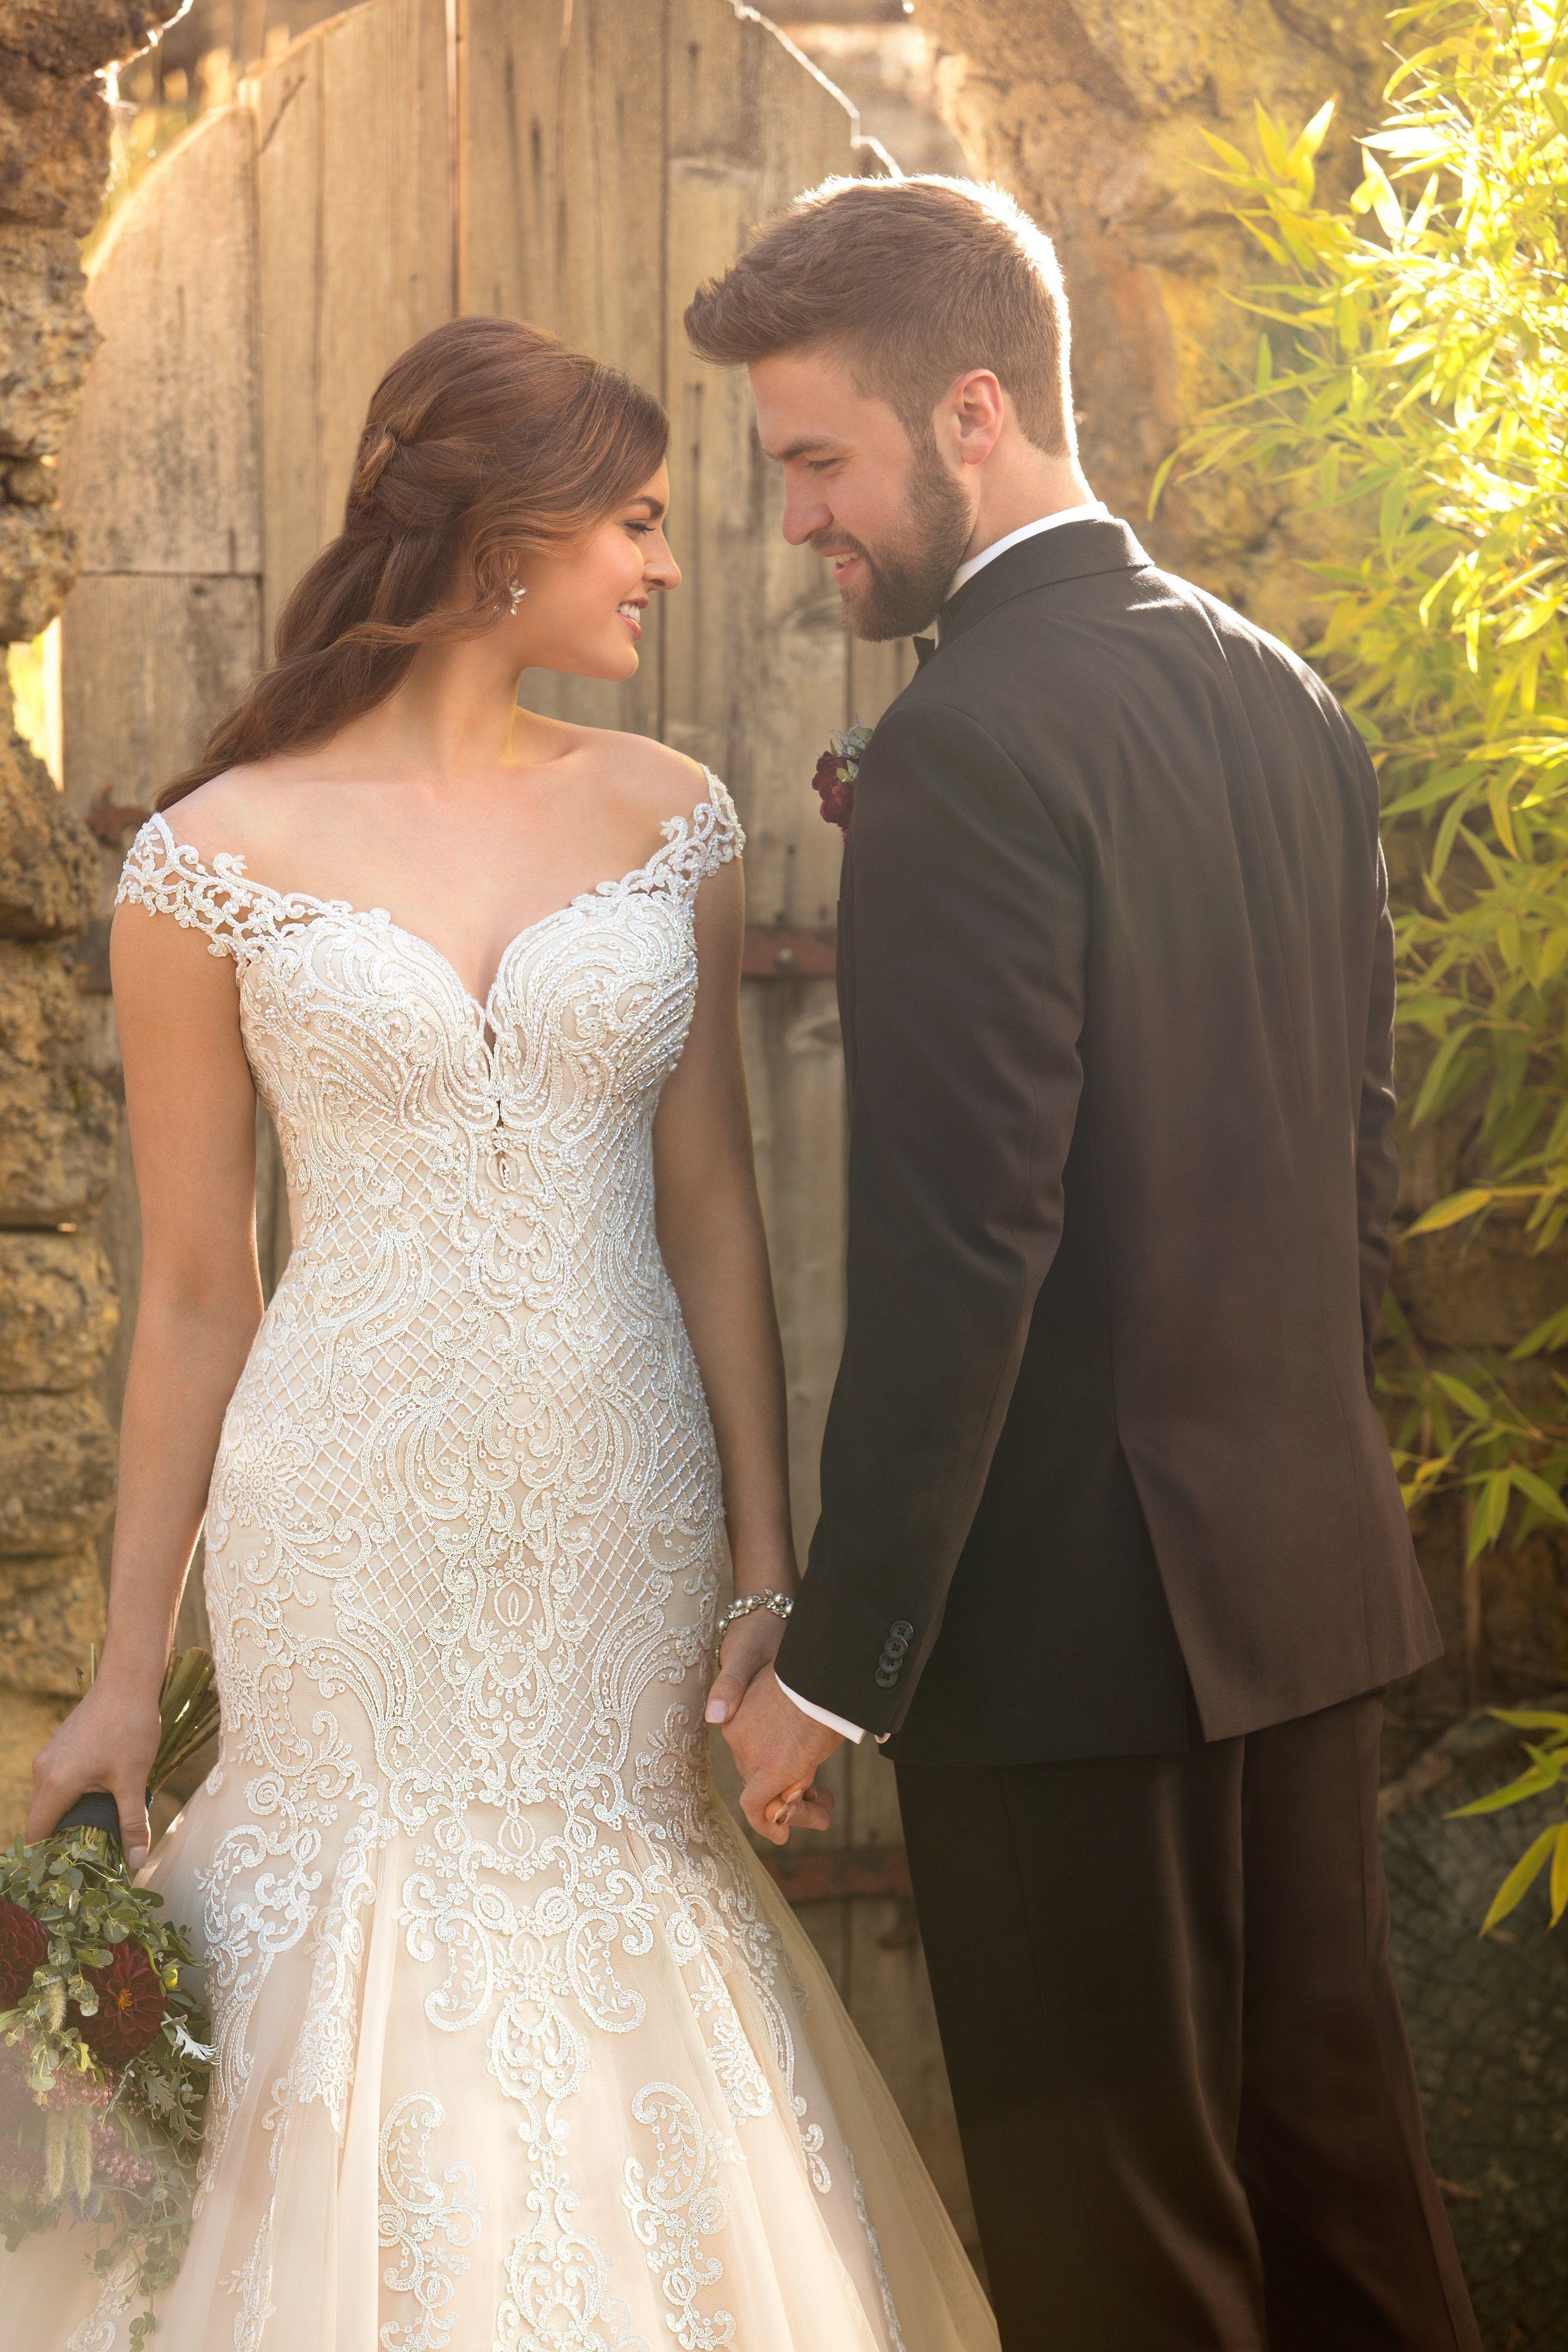 Mermaid Wedding Dress With Rich Beadwork Essense Of Australia Wedding Dresses Destination Wedding Dress Wedding Photoshoot [ 4344 x 2896 Pixel ]